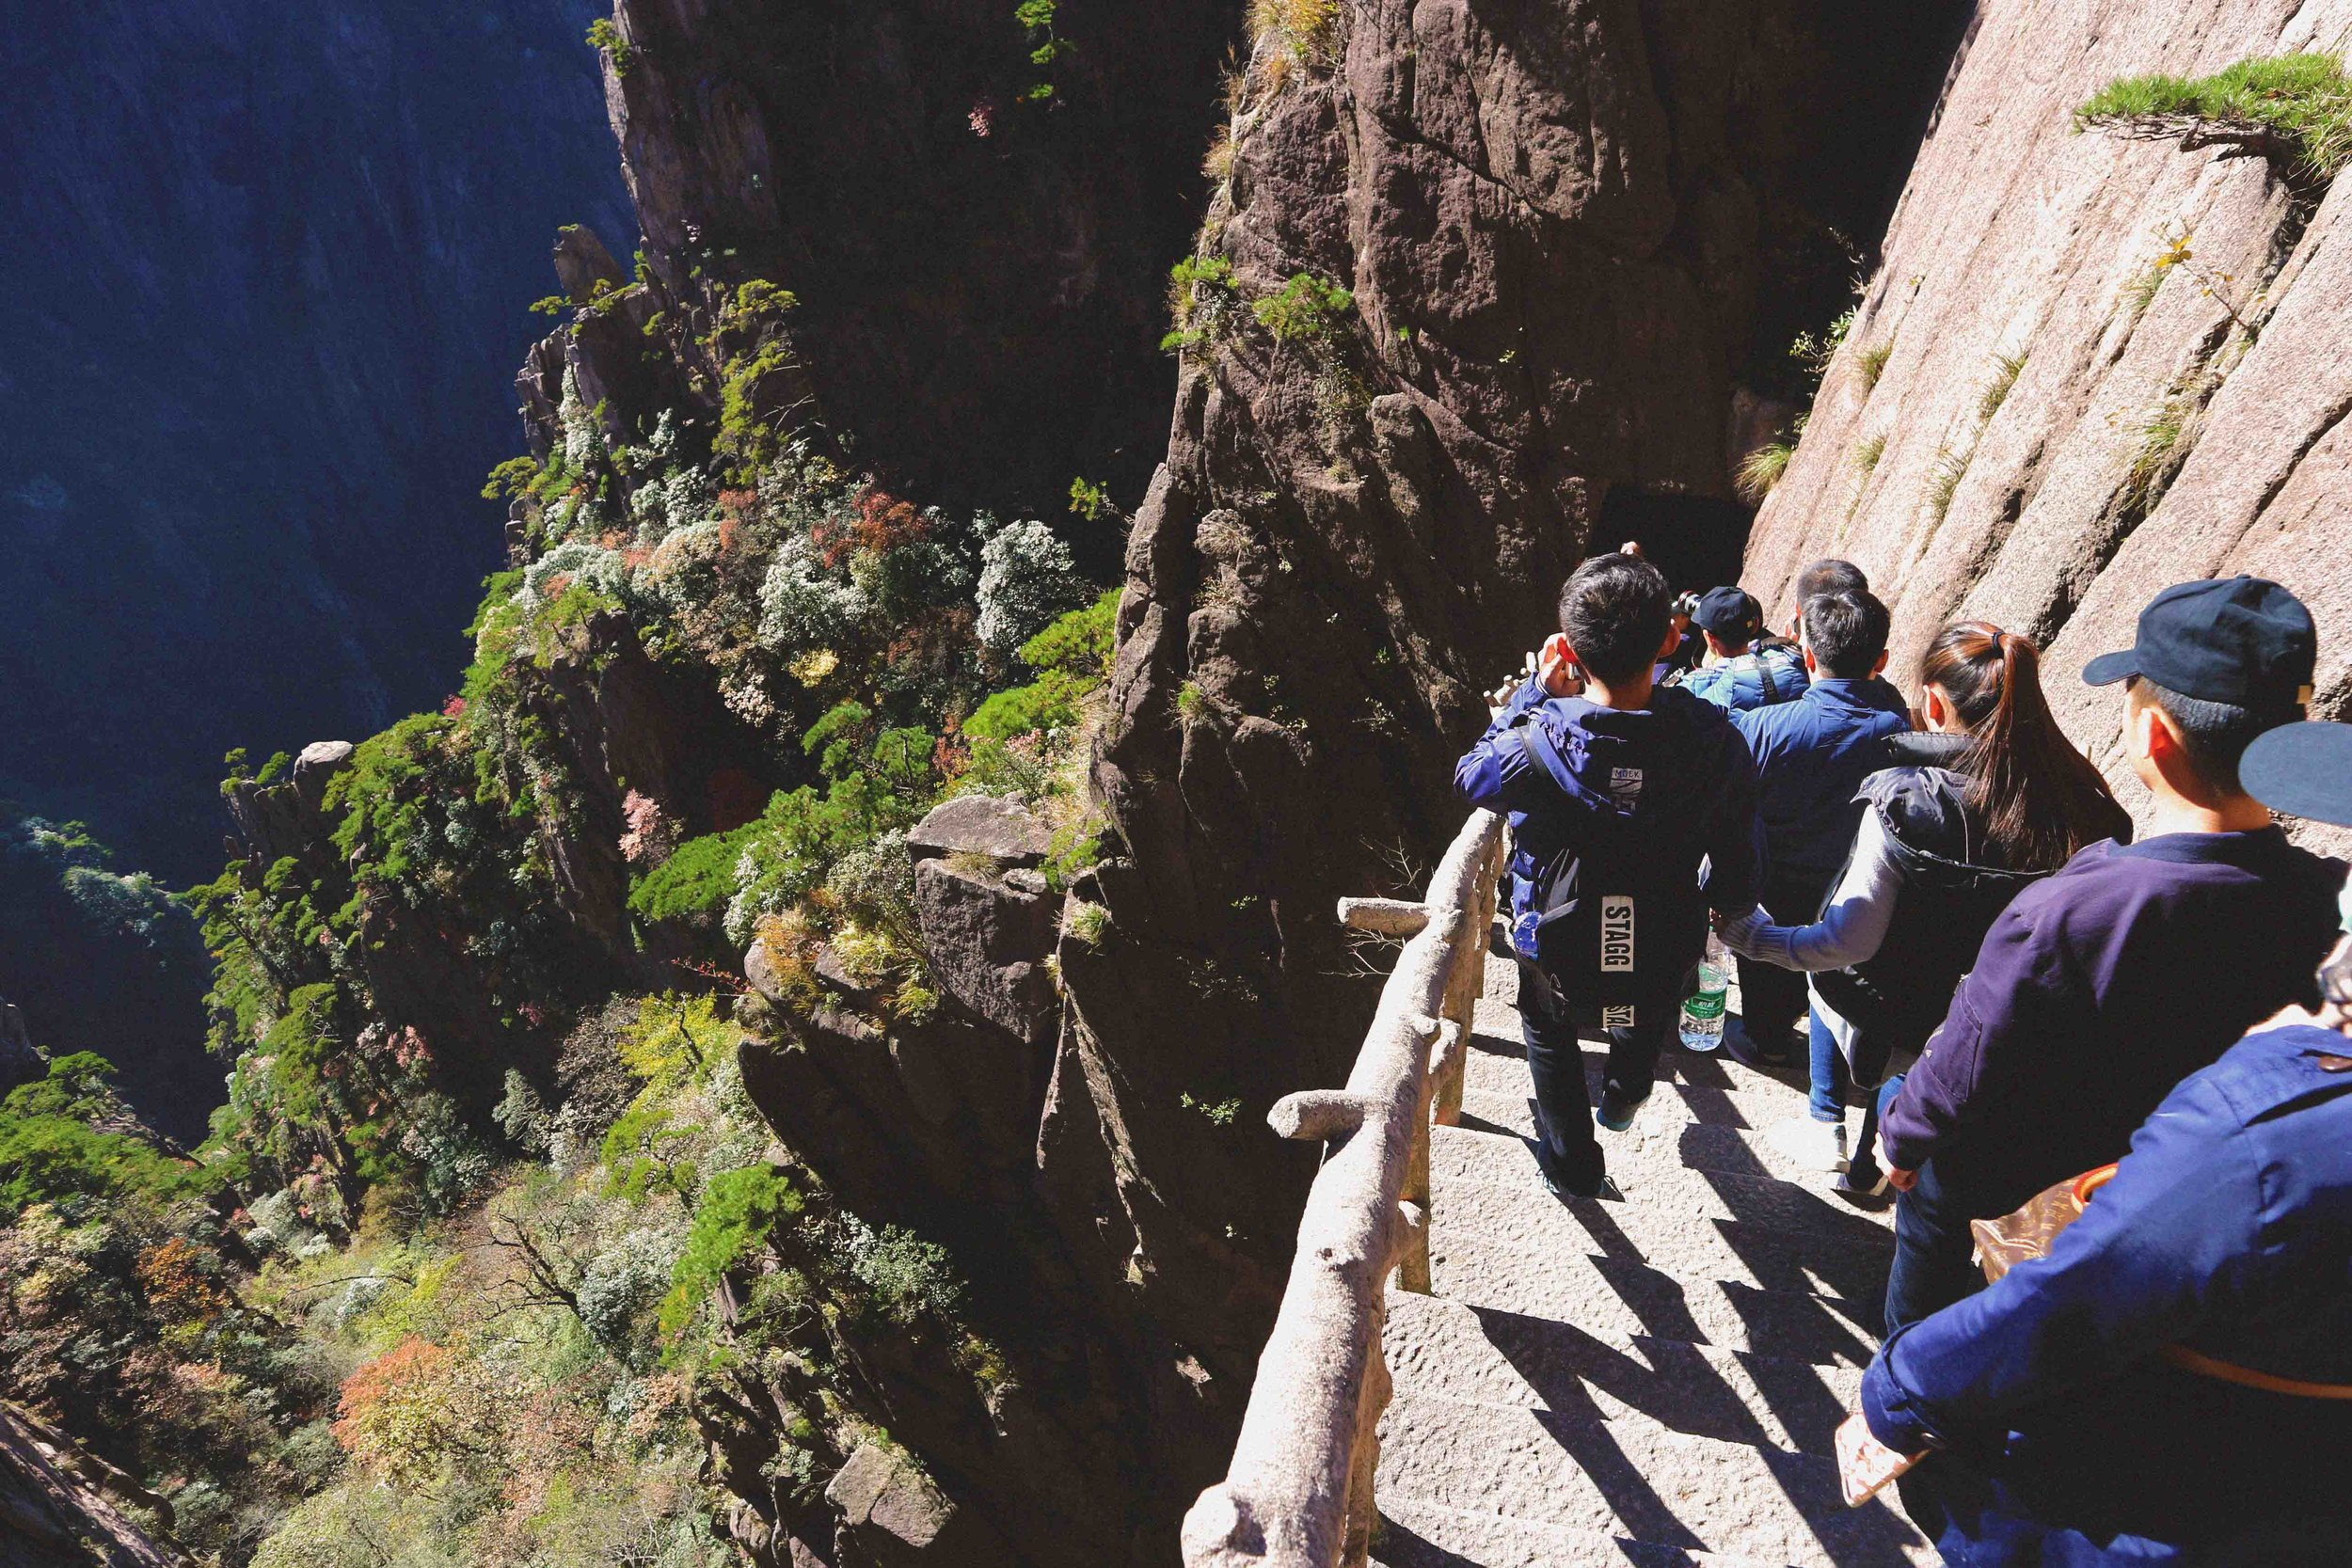 Crowds on the Xihai canyon